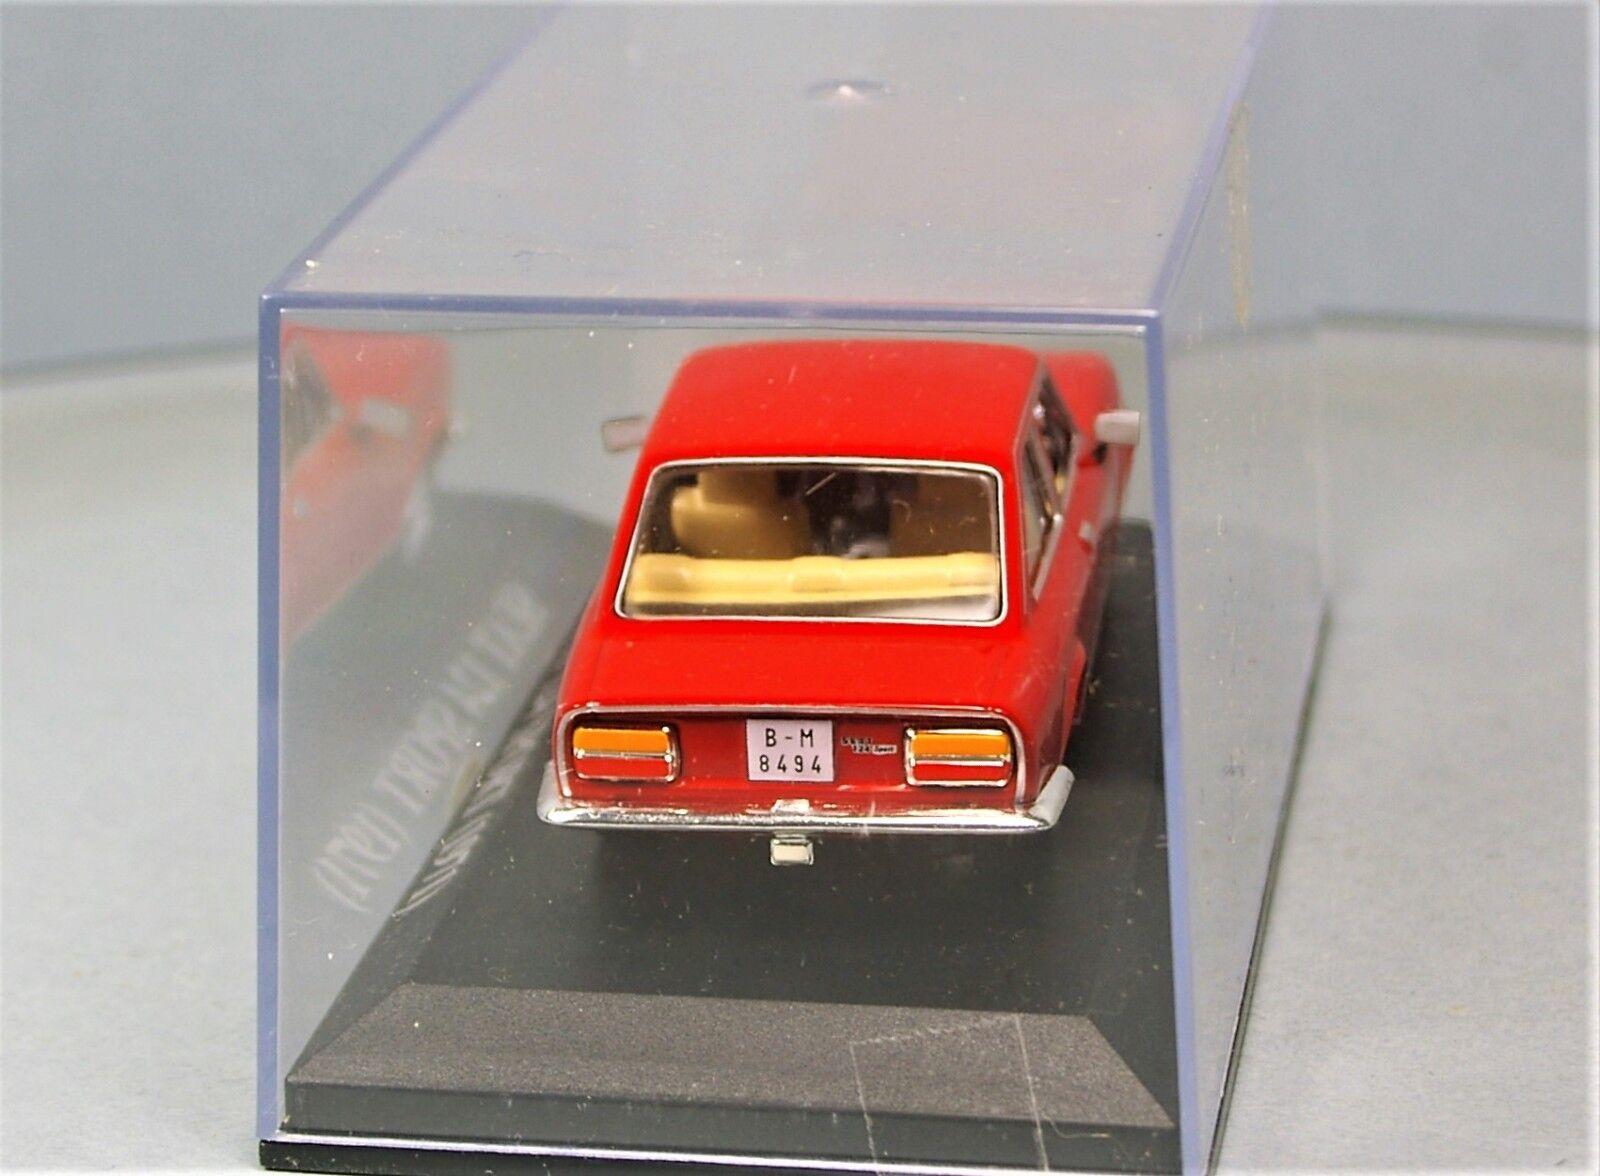 SEAT 124 SPORT 1971 Spain Spain Spain Edit. Similar FIAT - IXO 1 43 - 1 43 NEW & BOX RaRe 16bda9